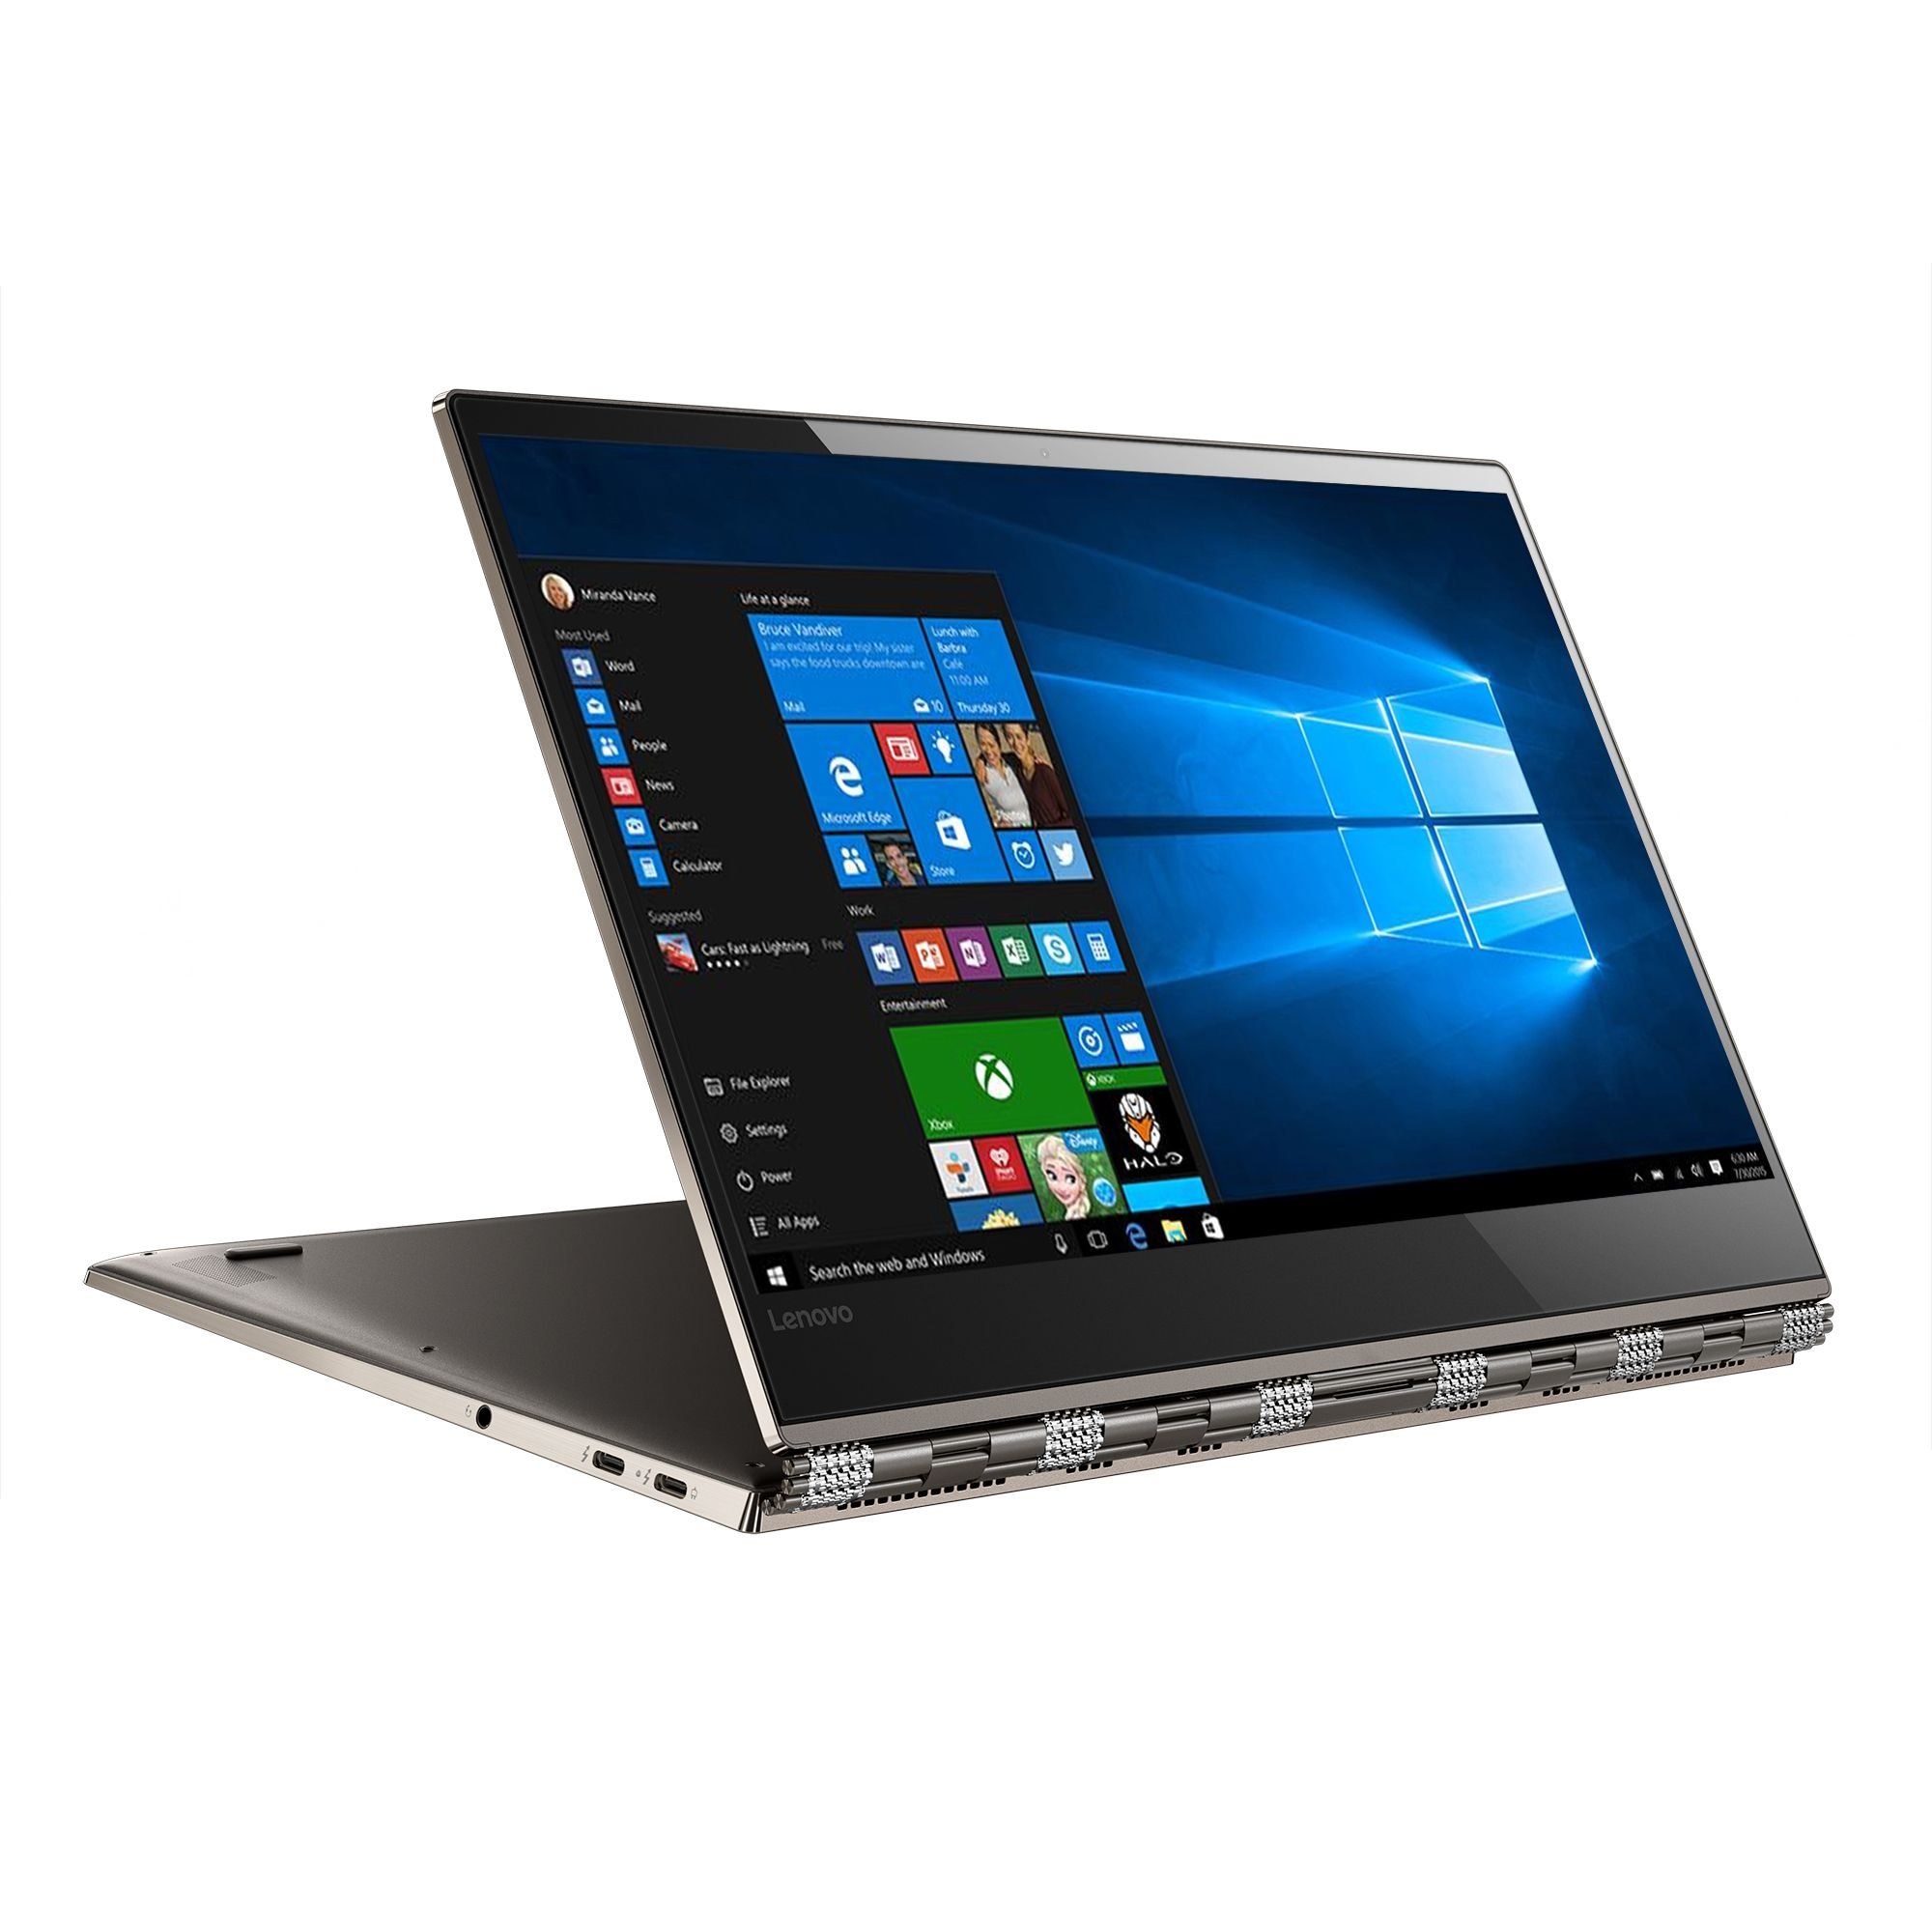 Ultrabook Lenovo Yoga 920 13.9 Full HD Touch Intel Core i7-8550U RAM 8GB SSD 512GB Windows 10 Home Bronze